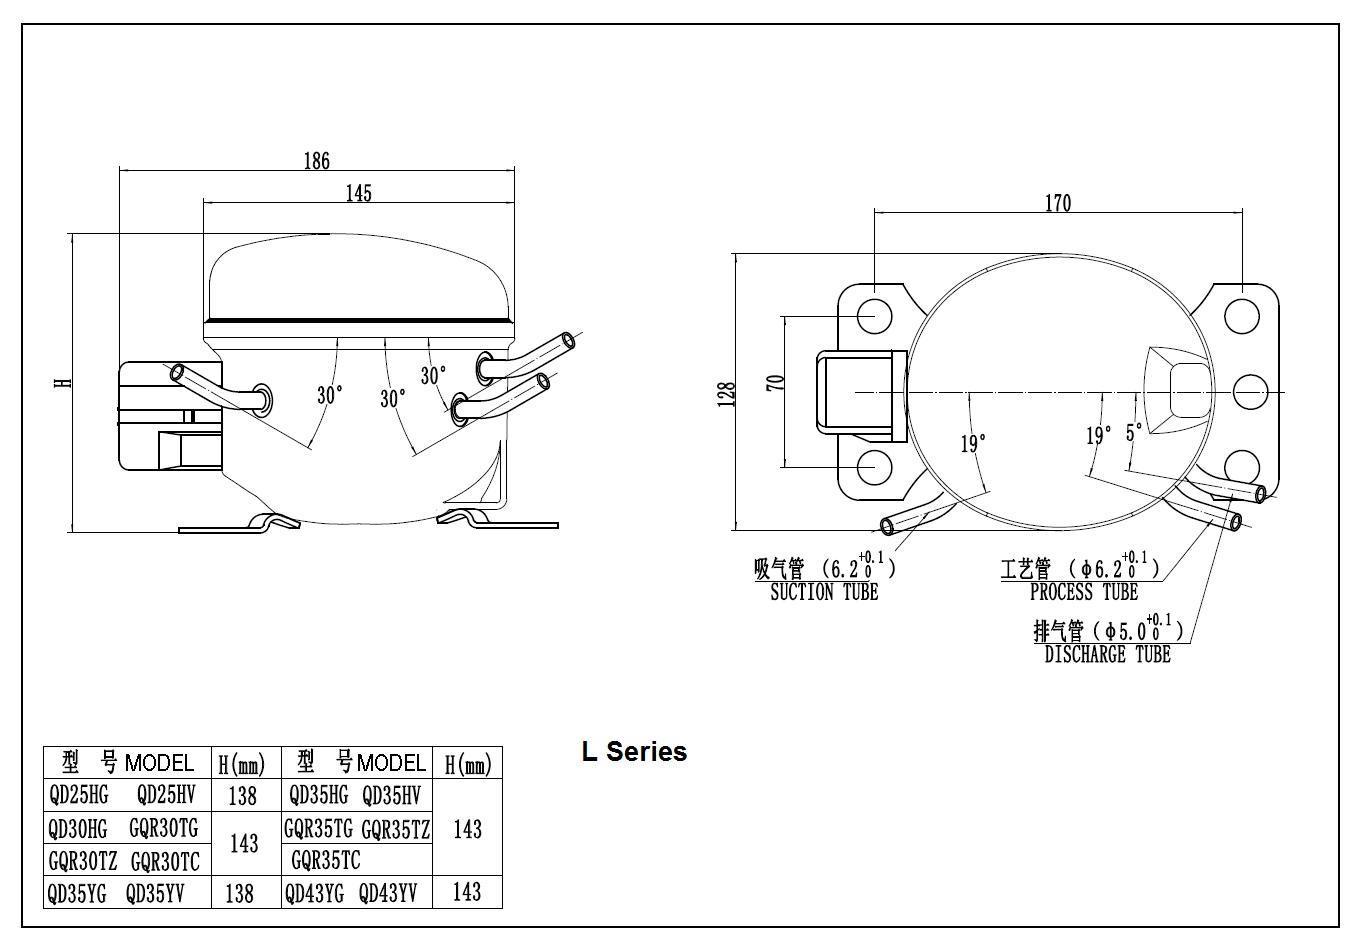 hight resolution of hermetic freezer compressor model qd43yg r600a gas 220v